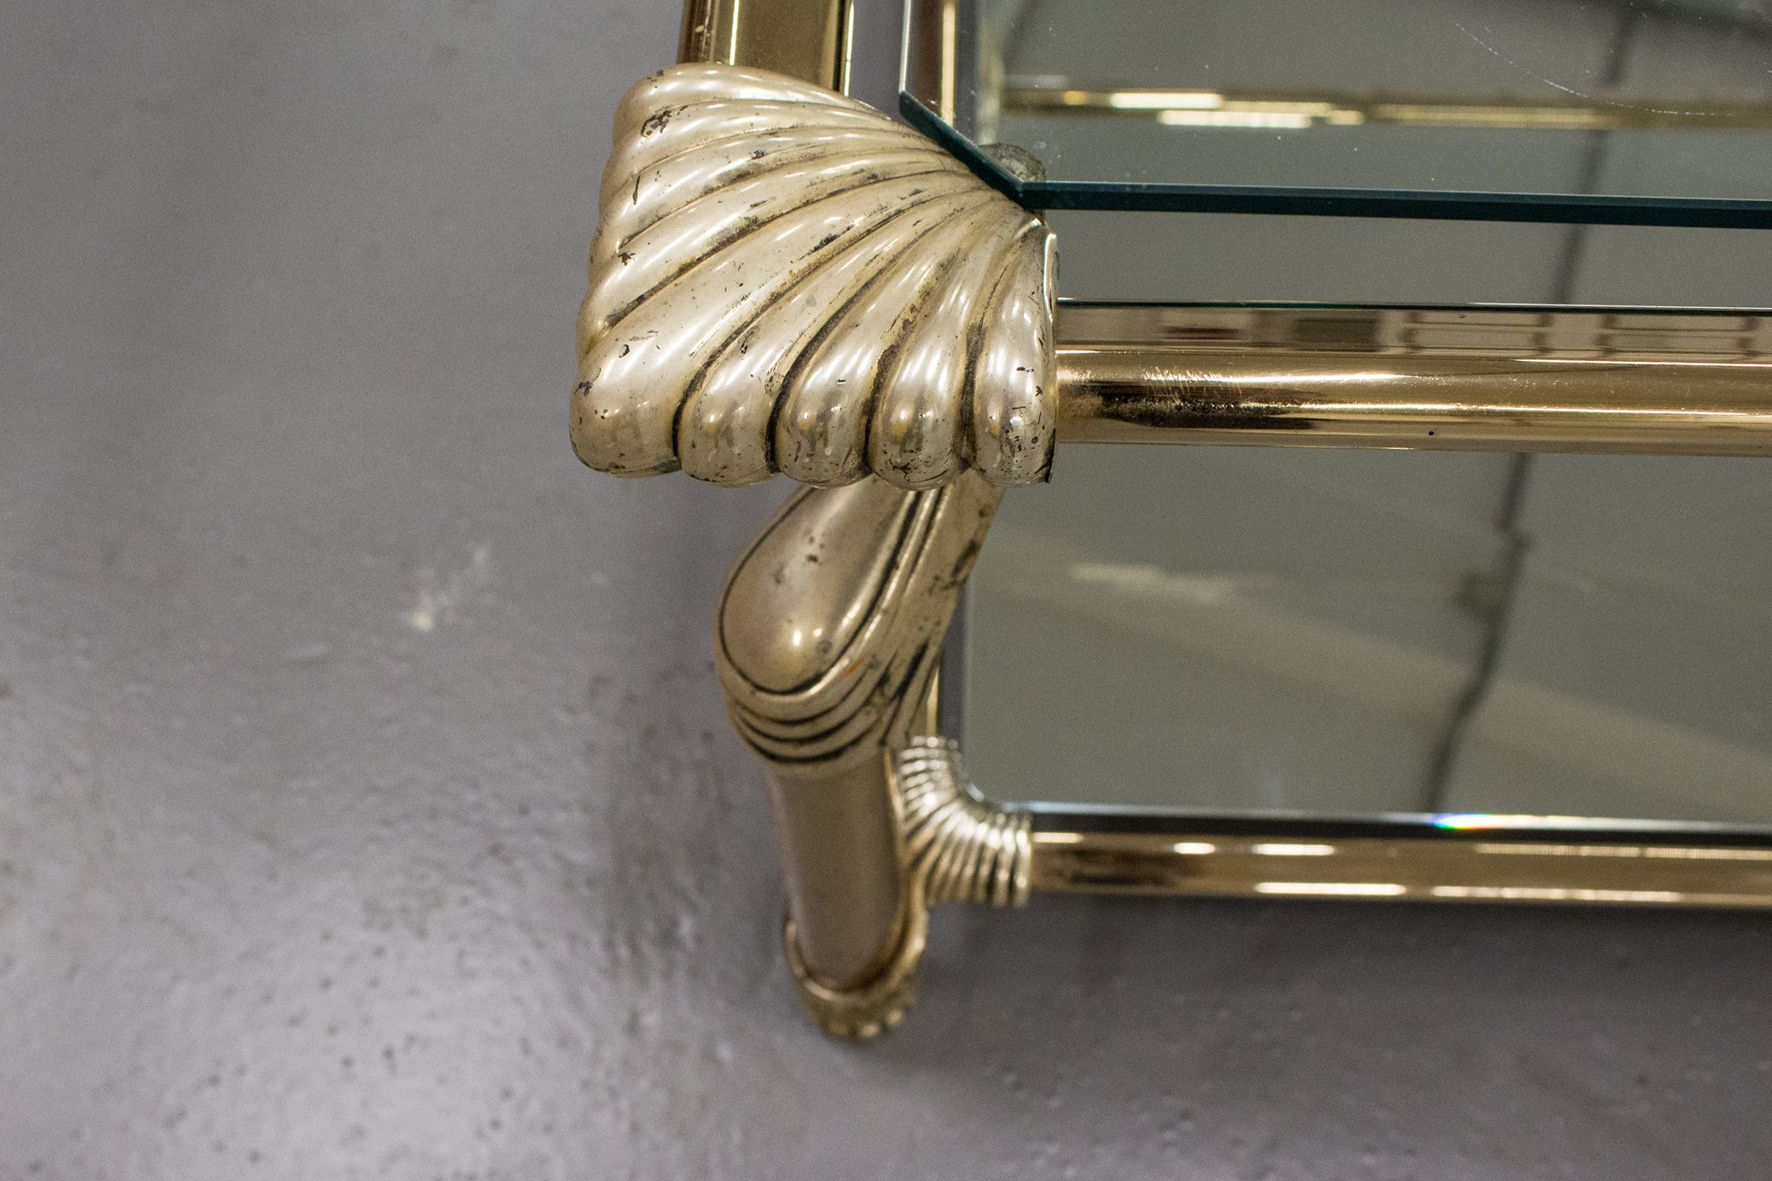 Muebles Curvasa - Tavolino Da Caff Vintage Con Struttura In Ottone Vetro E [mjhdah]https://cdn10.pamono.com/p/z/2/1/211006_yxf9ltnhb3/tavolino-da-caffe-vintage-con-struttura-in-ottone-vetro-e-specchio-di-muebles-curvasa-immagine-1.jpg